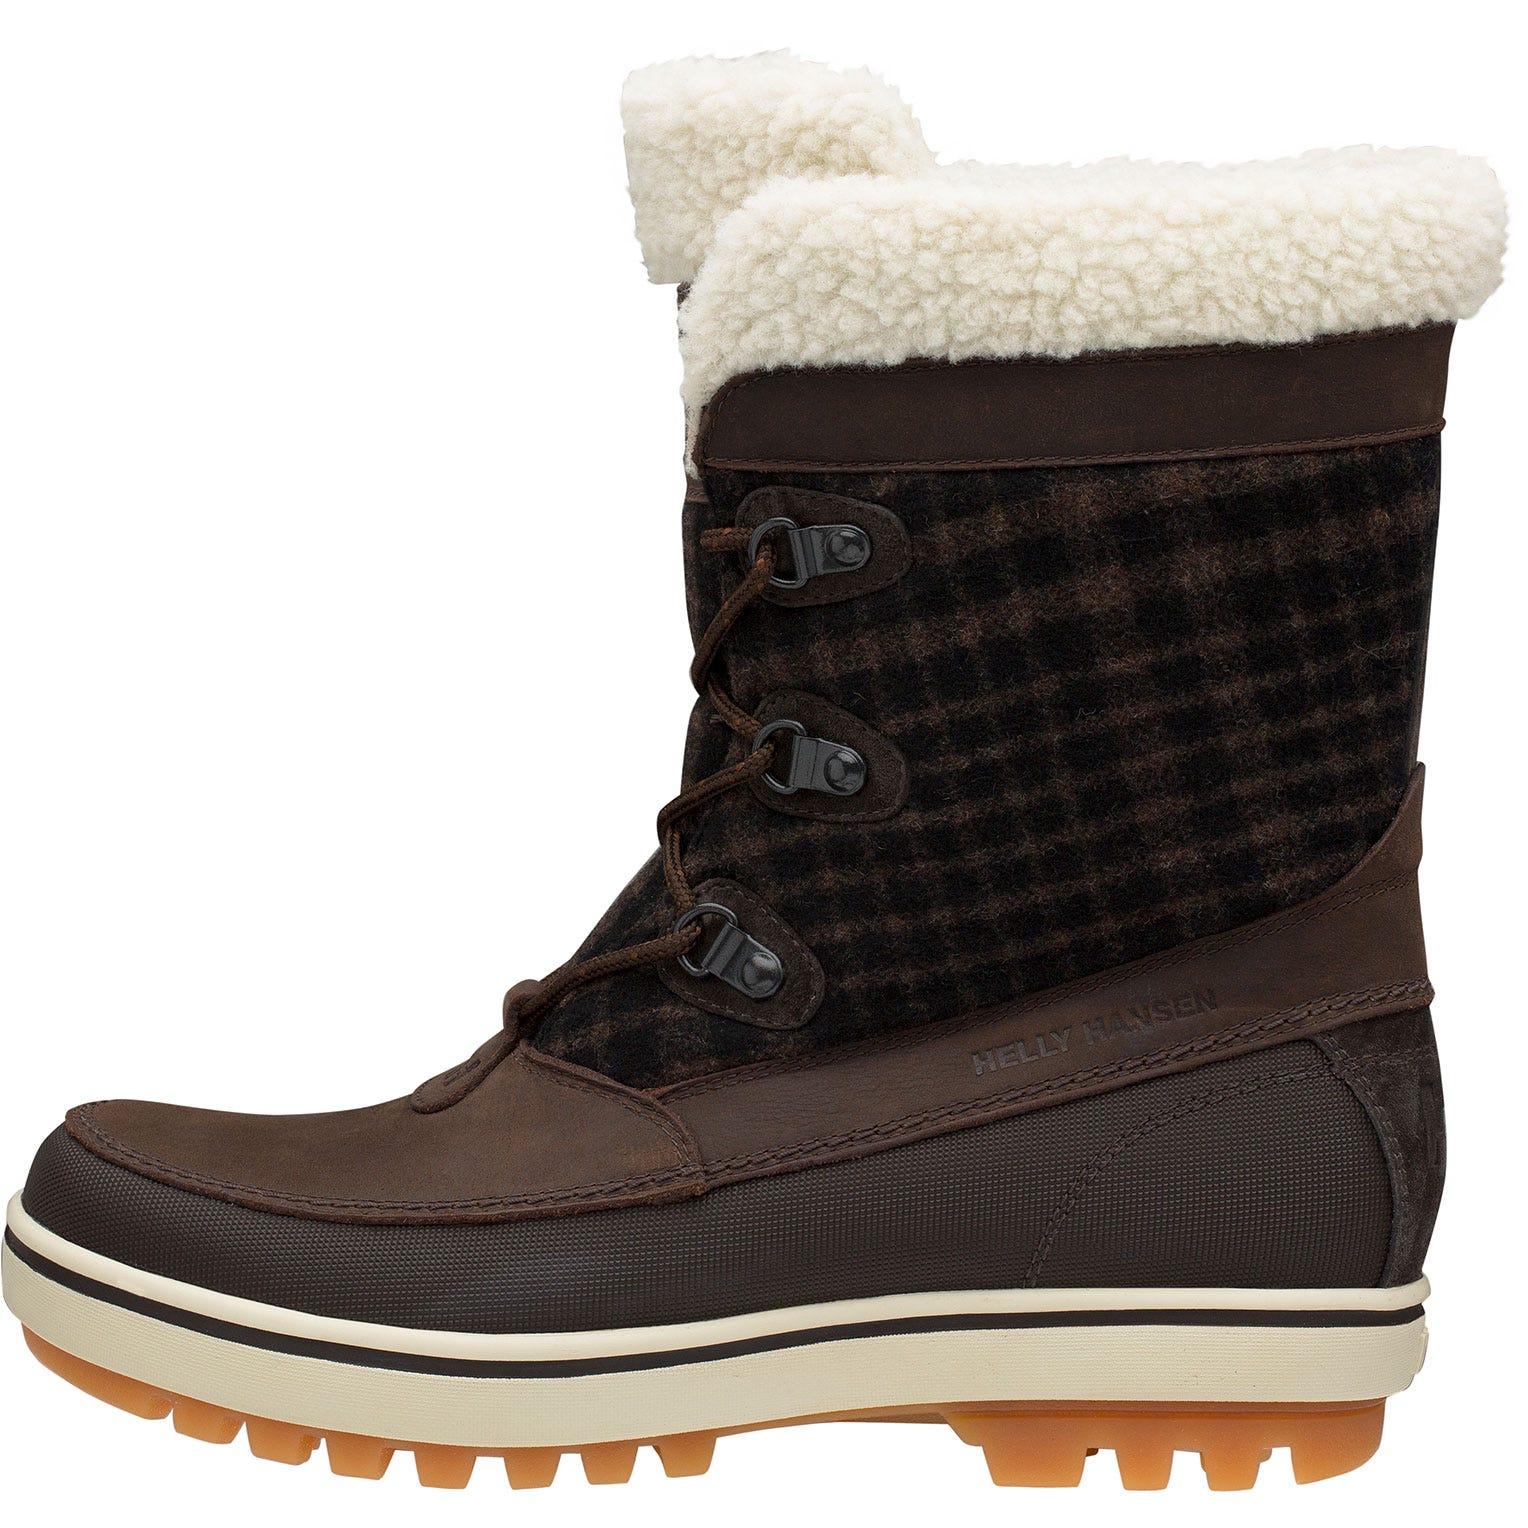 Helly Hansen W Georgina Womens Winter Boot Brown 37.5/6.5